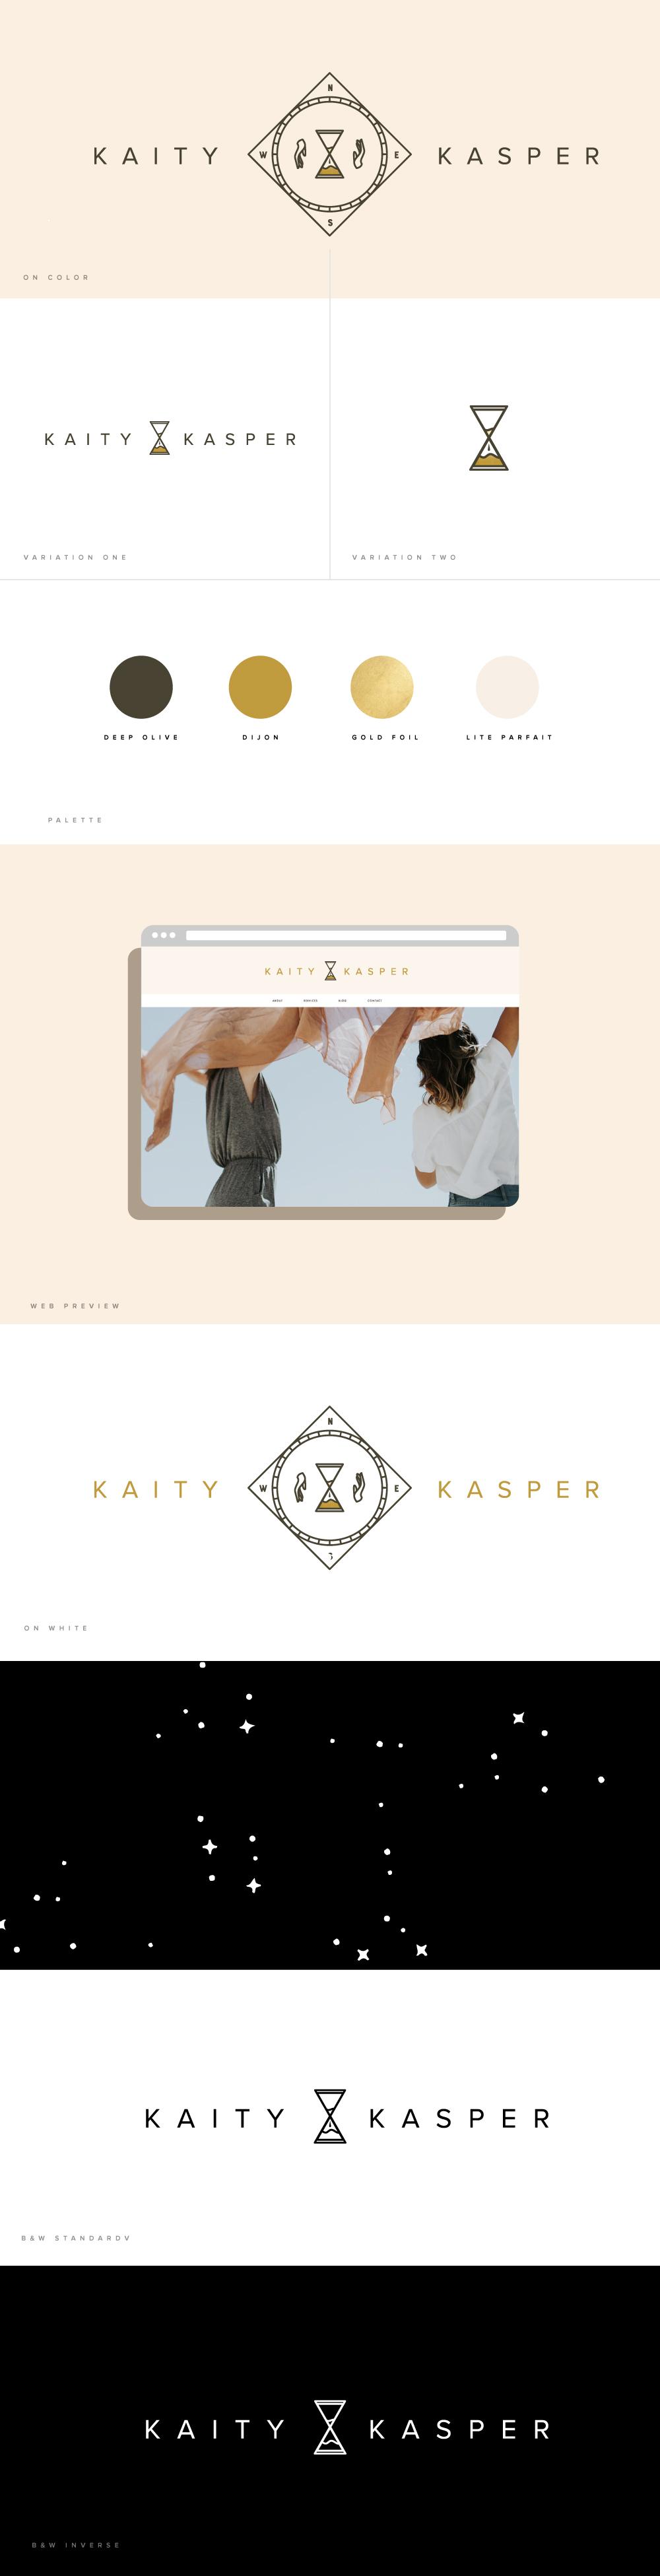 Kaity-Kasper-Revision-1.3.jpg